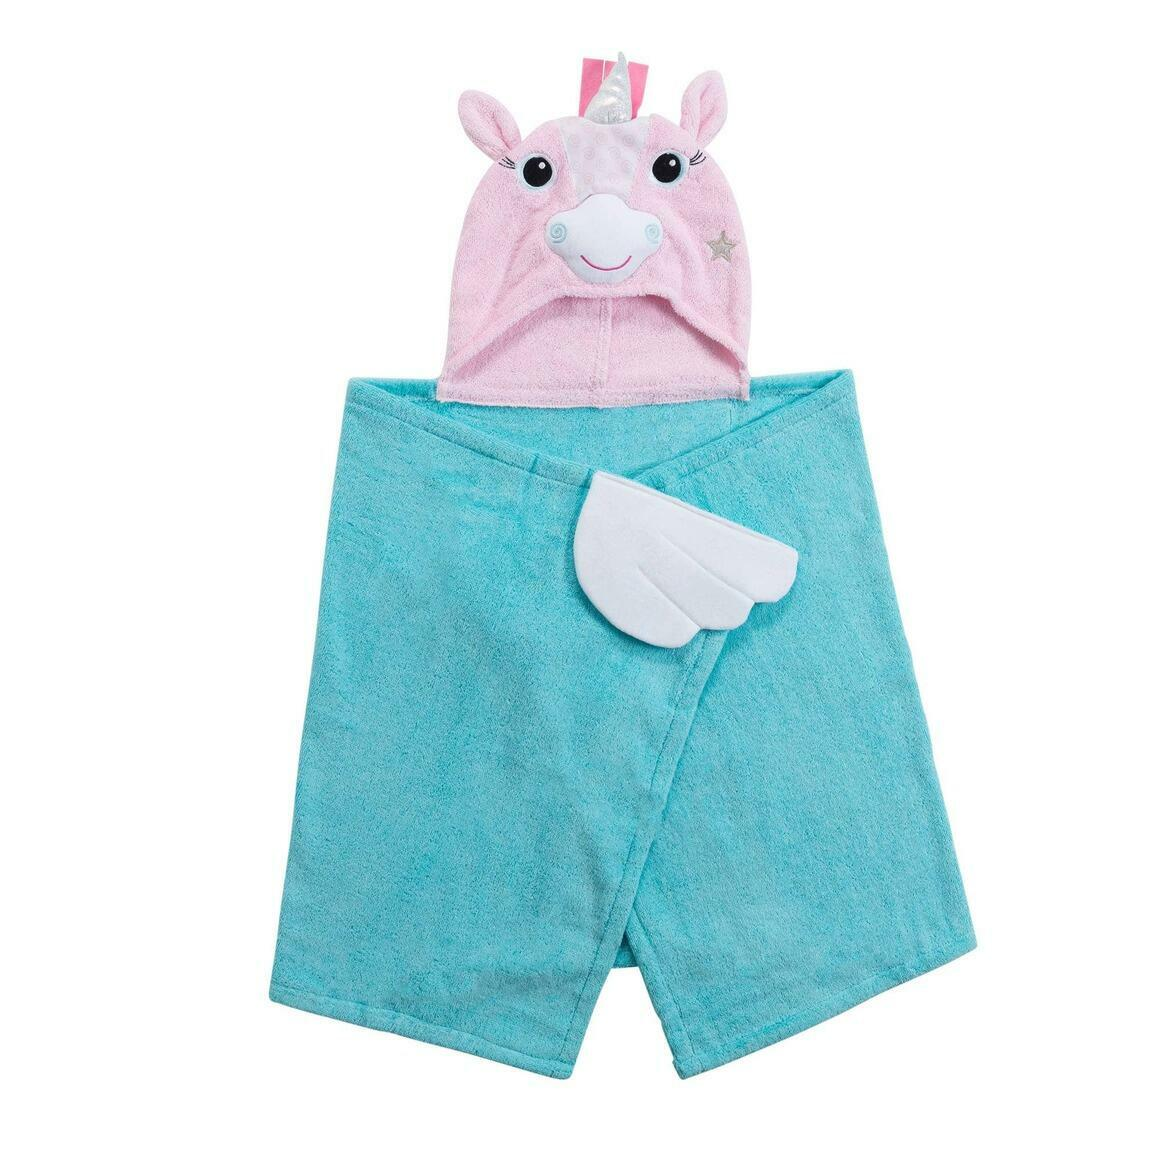 Allie the Alicorn Toddler Towel | Trada Marketplace